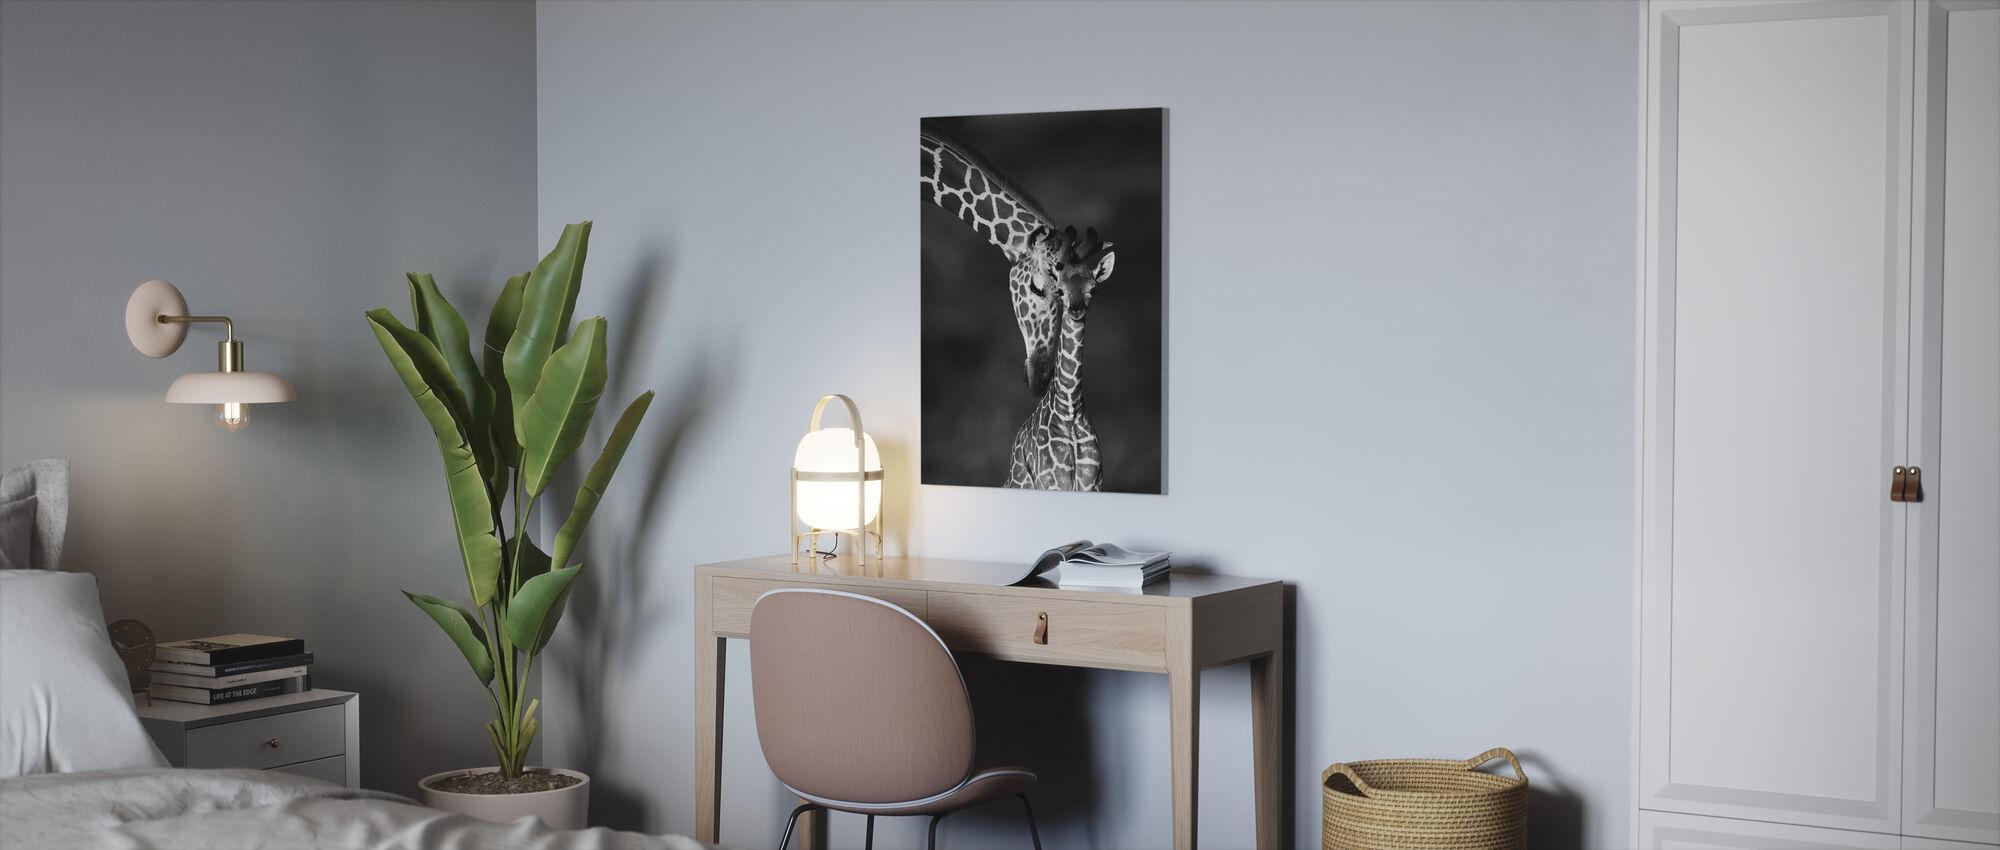 Giraffes - b/w - Canvas print - Office